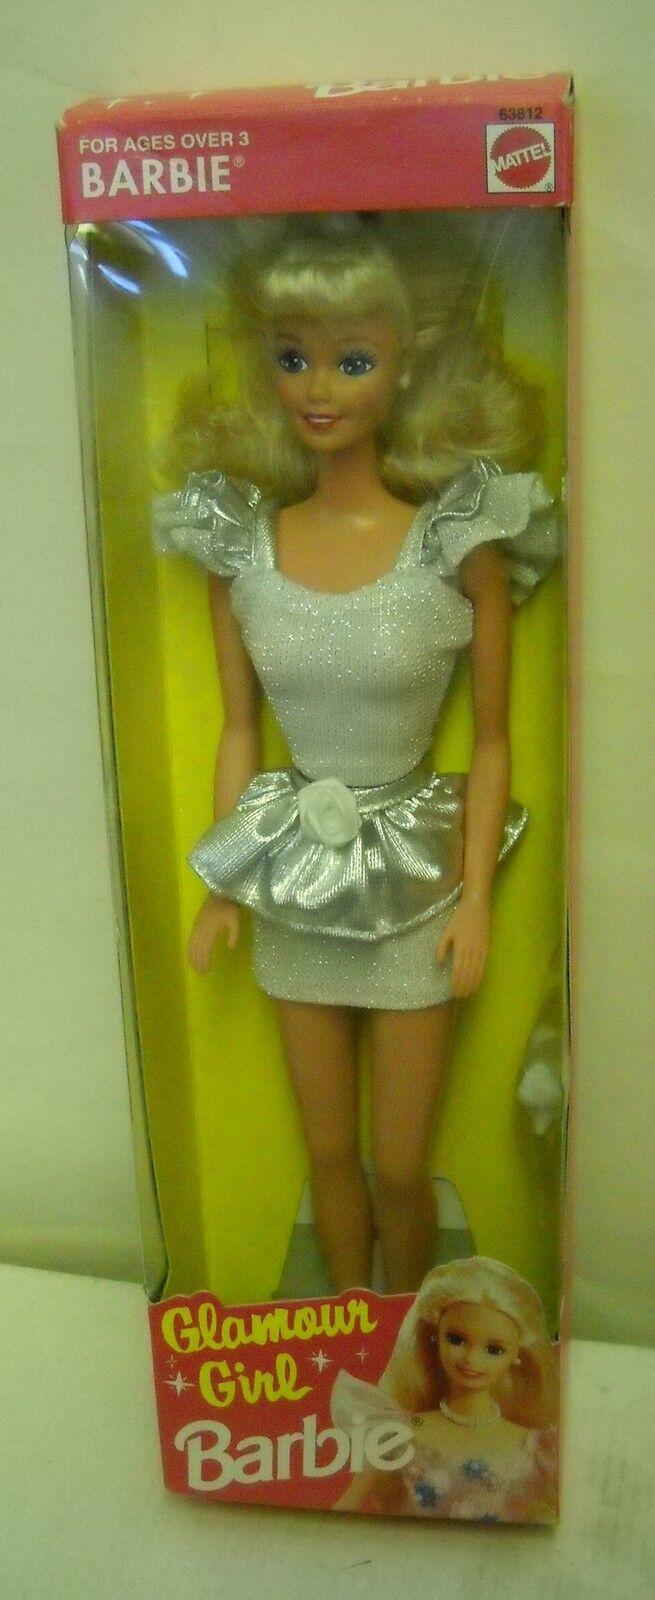 Nunca quitado de la Caja Mattel Muñeca Barbie Extranjeros de Filipinas Glamour Girl emisión extranjera